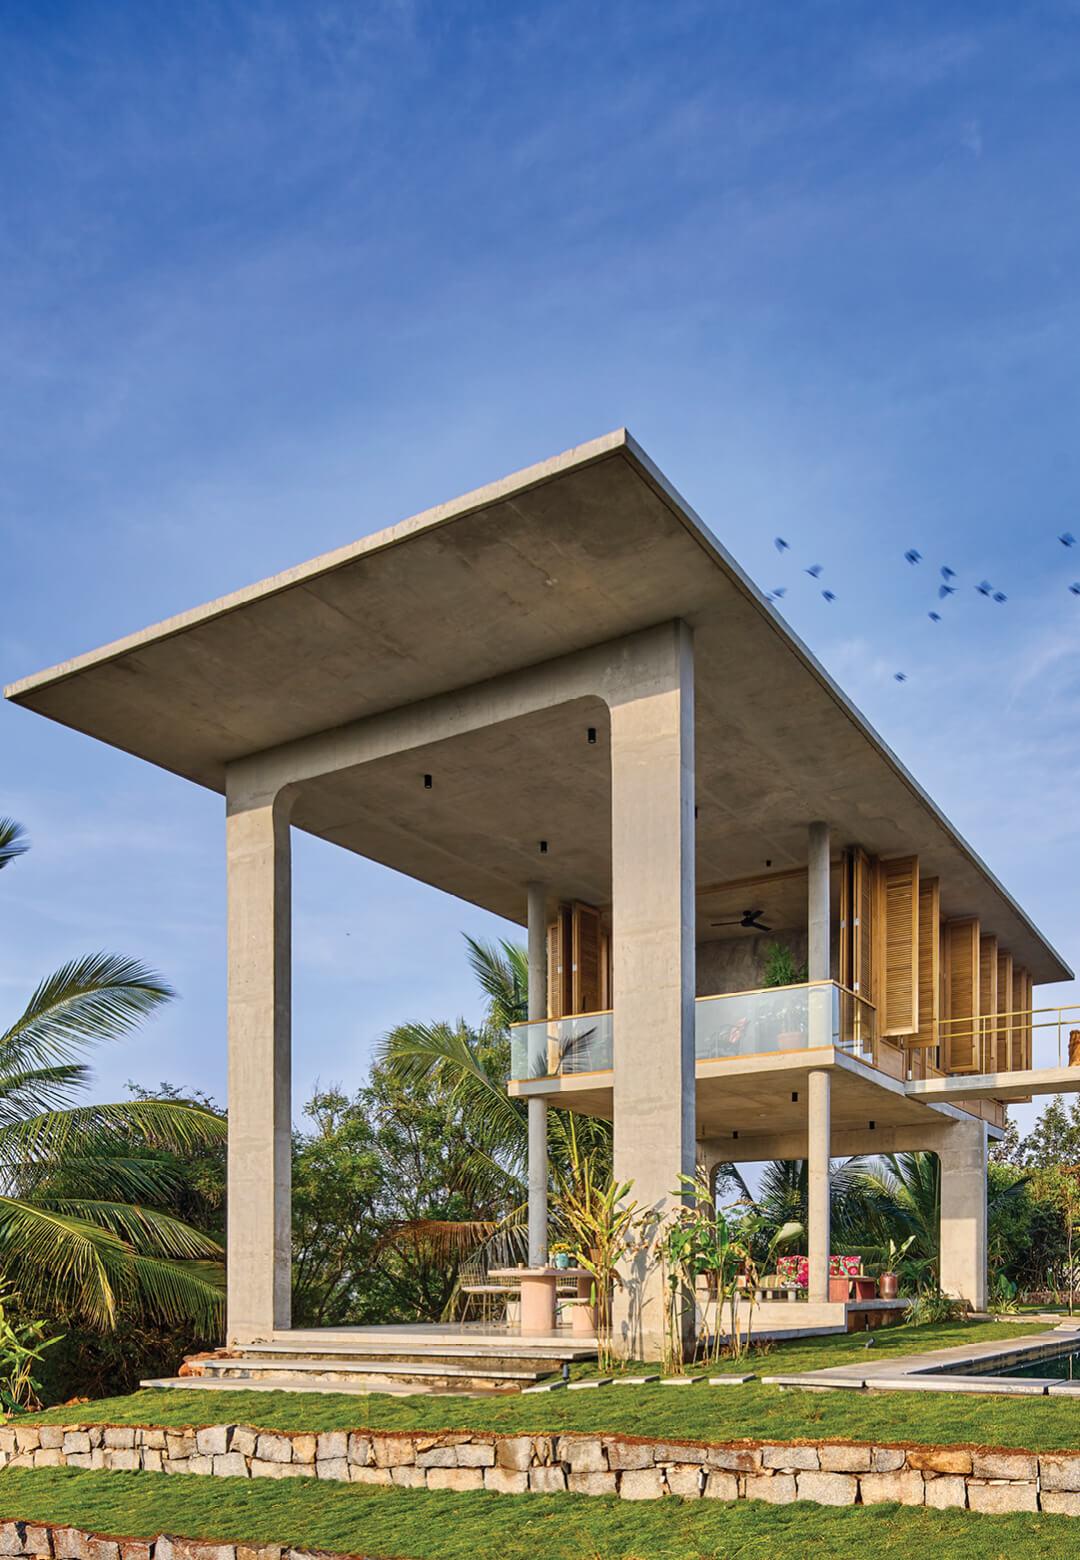 Ksaraah residence is a weekend retreat overlooking the Savandurga hill in rural Bengaluru | Ksaraah Residence | Taliesyn | STIRworld